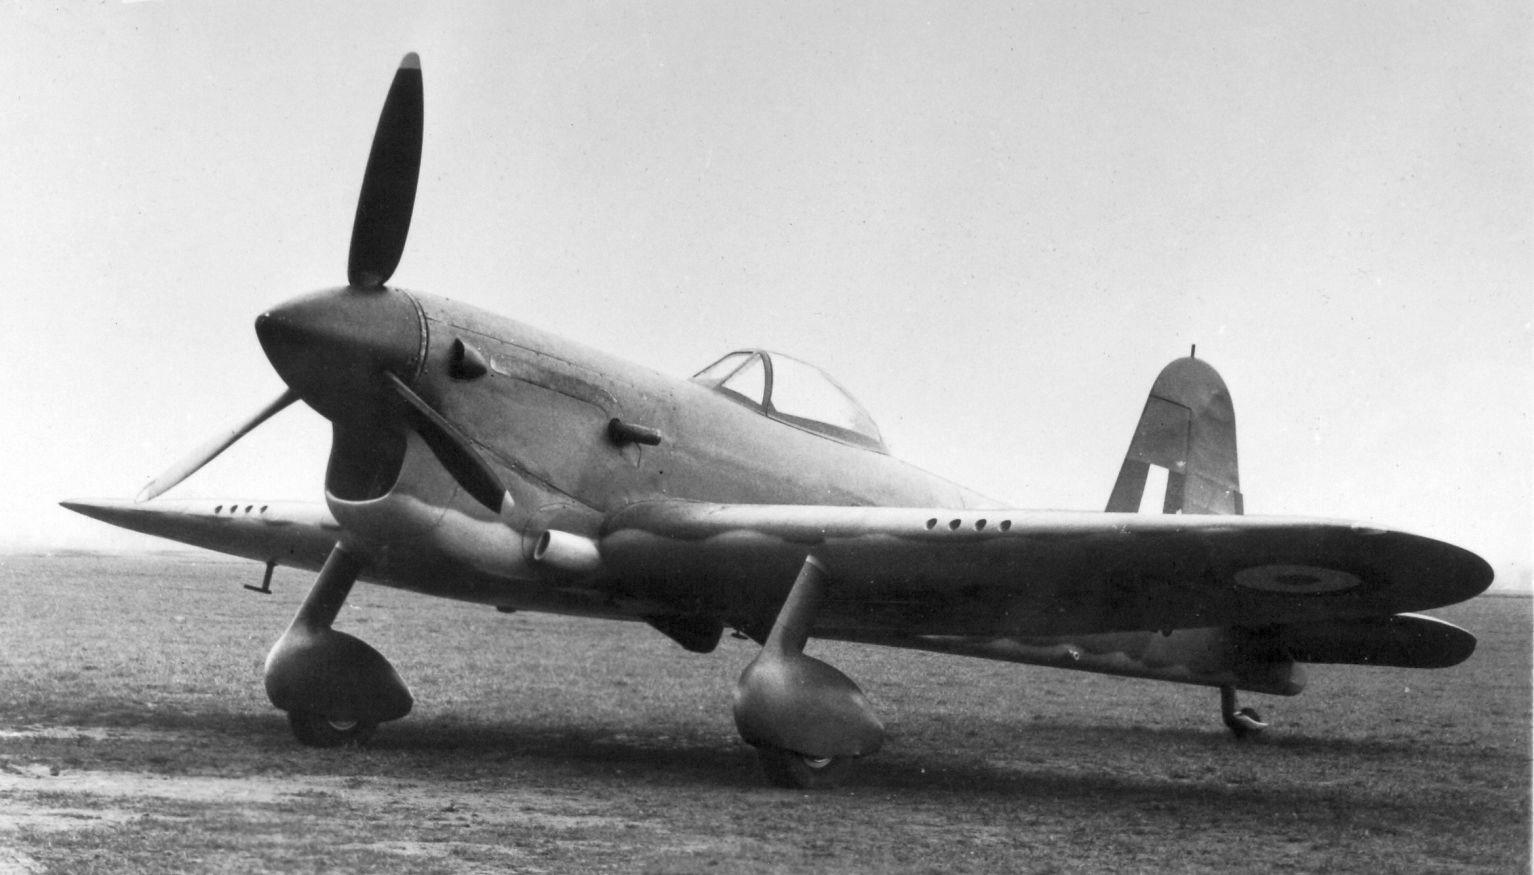 15_miles_m-20_single_seat_fighter_15216625303.jpg